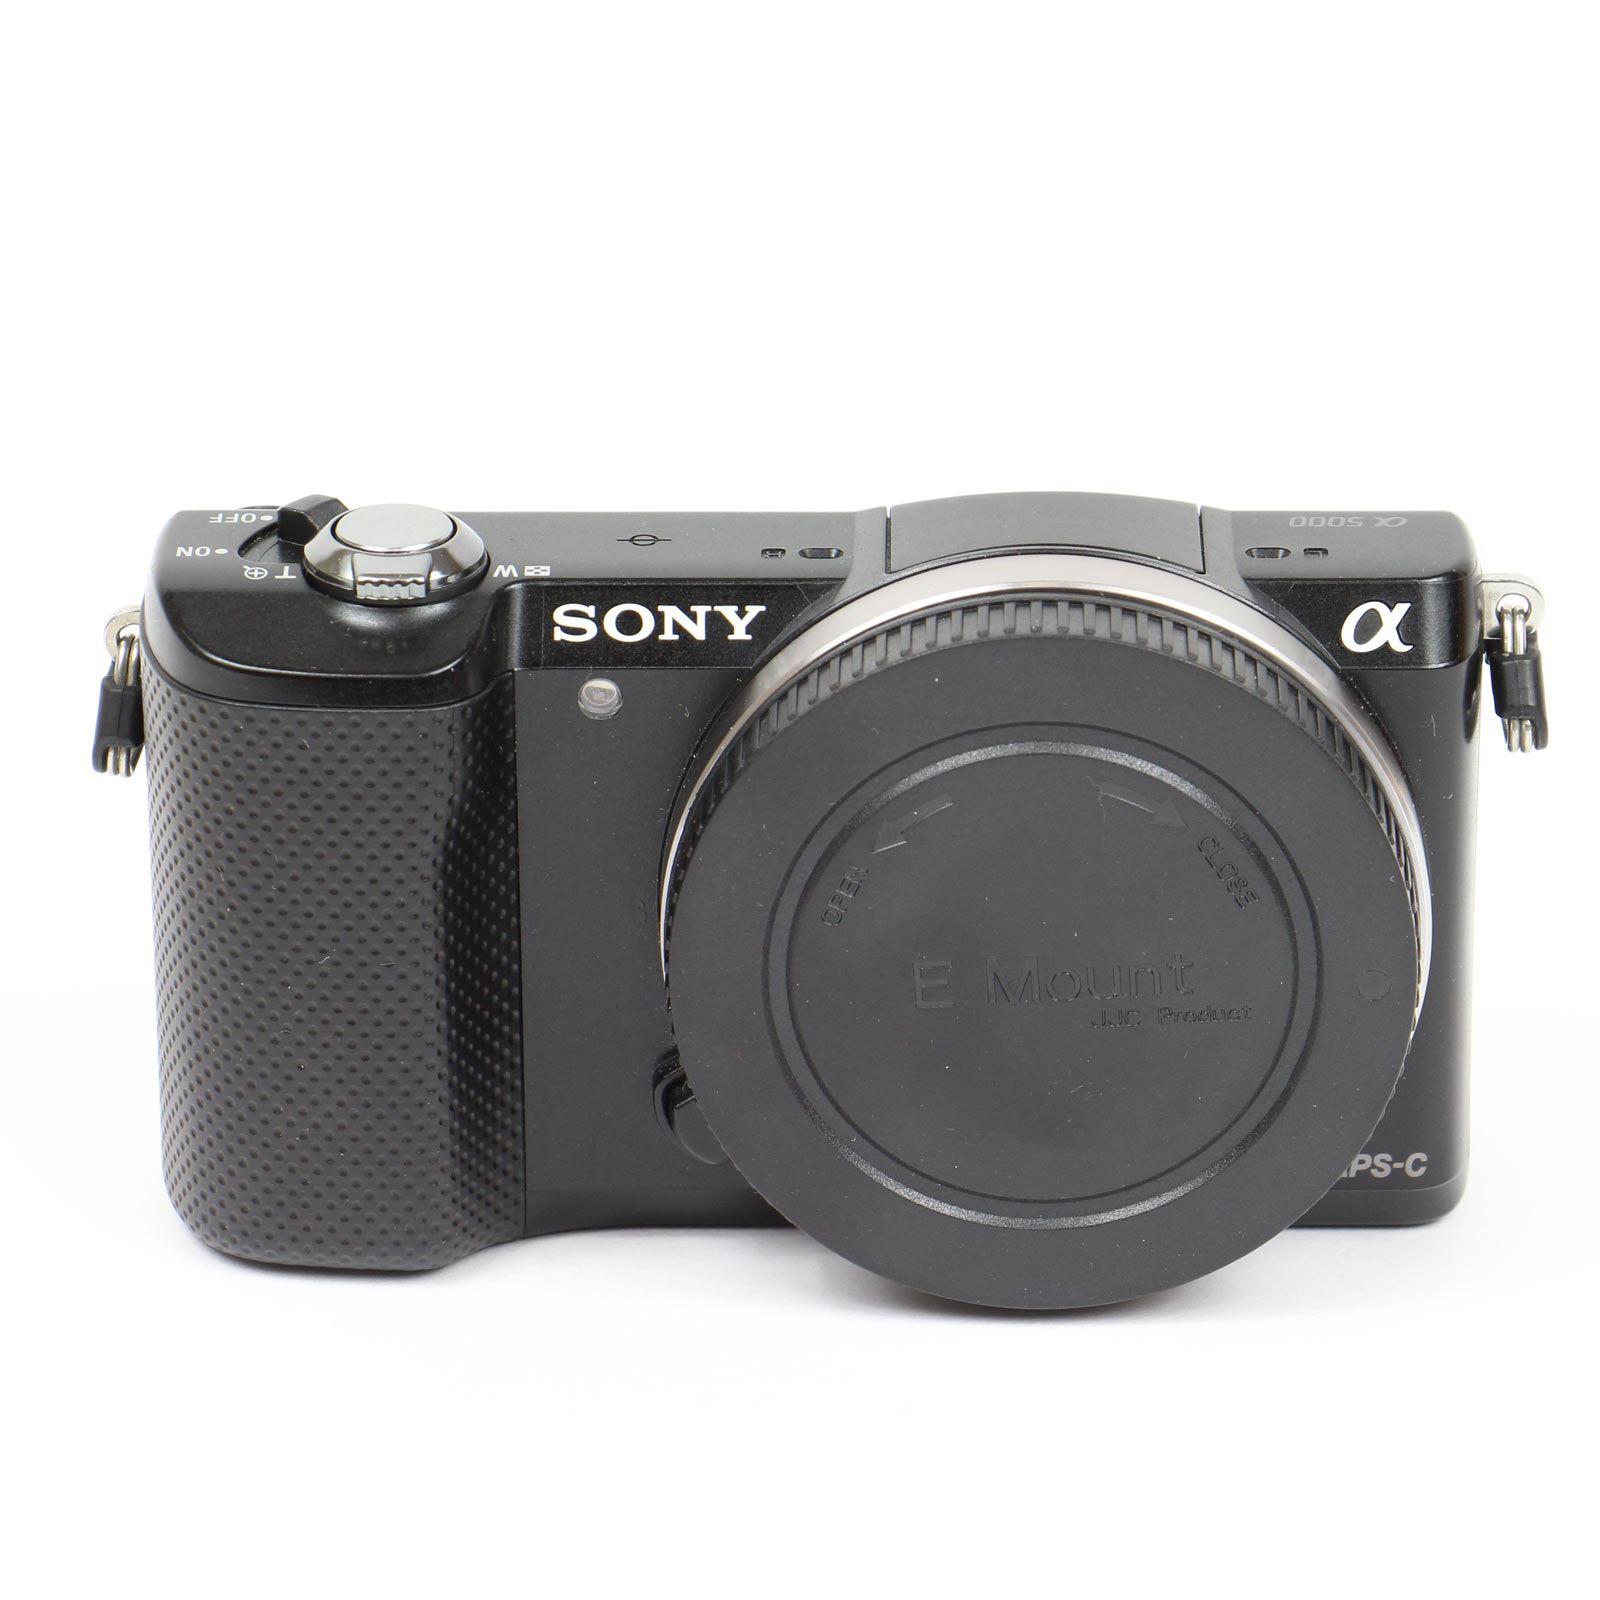 Sony Alpha A5000 Body only